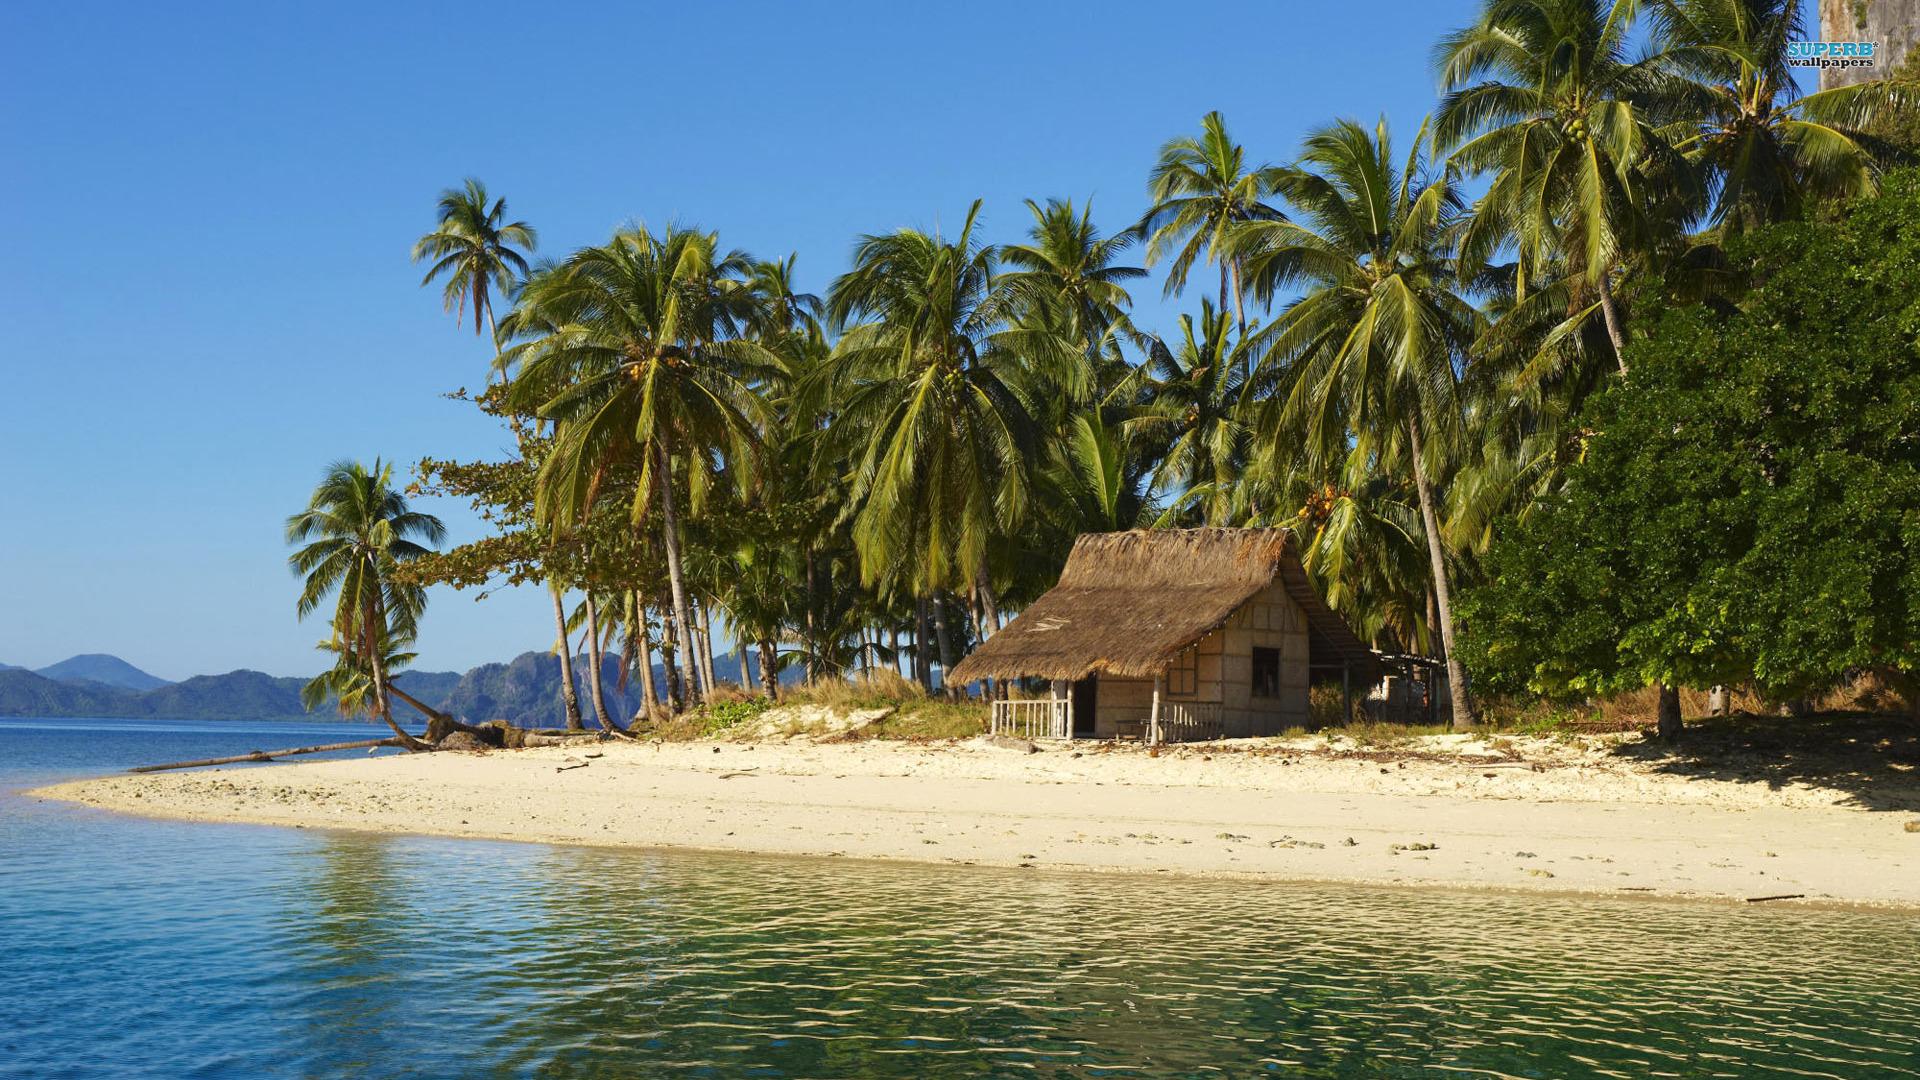 Beach House On Tropical Island HD Wallpaper 1920x1080 ID28919 1920x1080